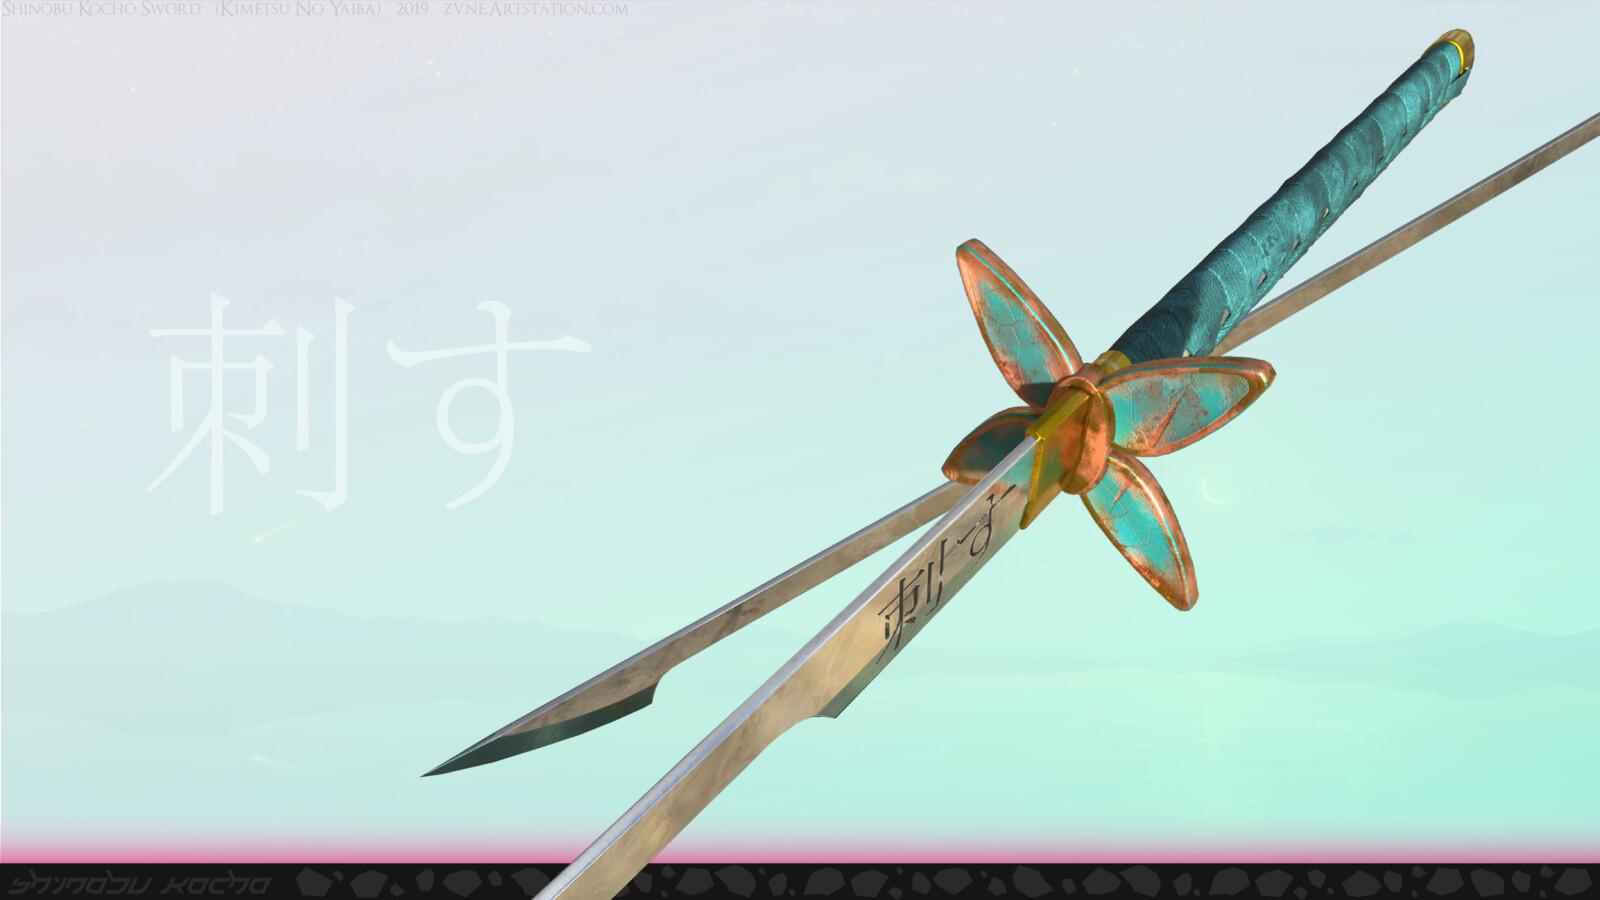 Shinobu Kocho Sword